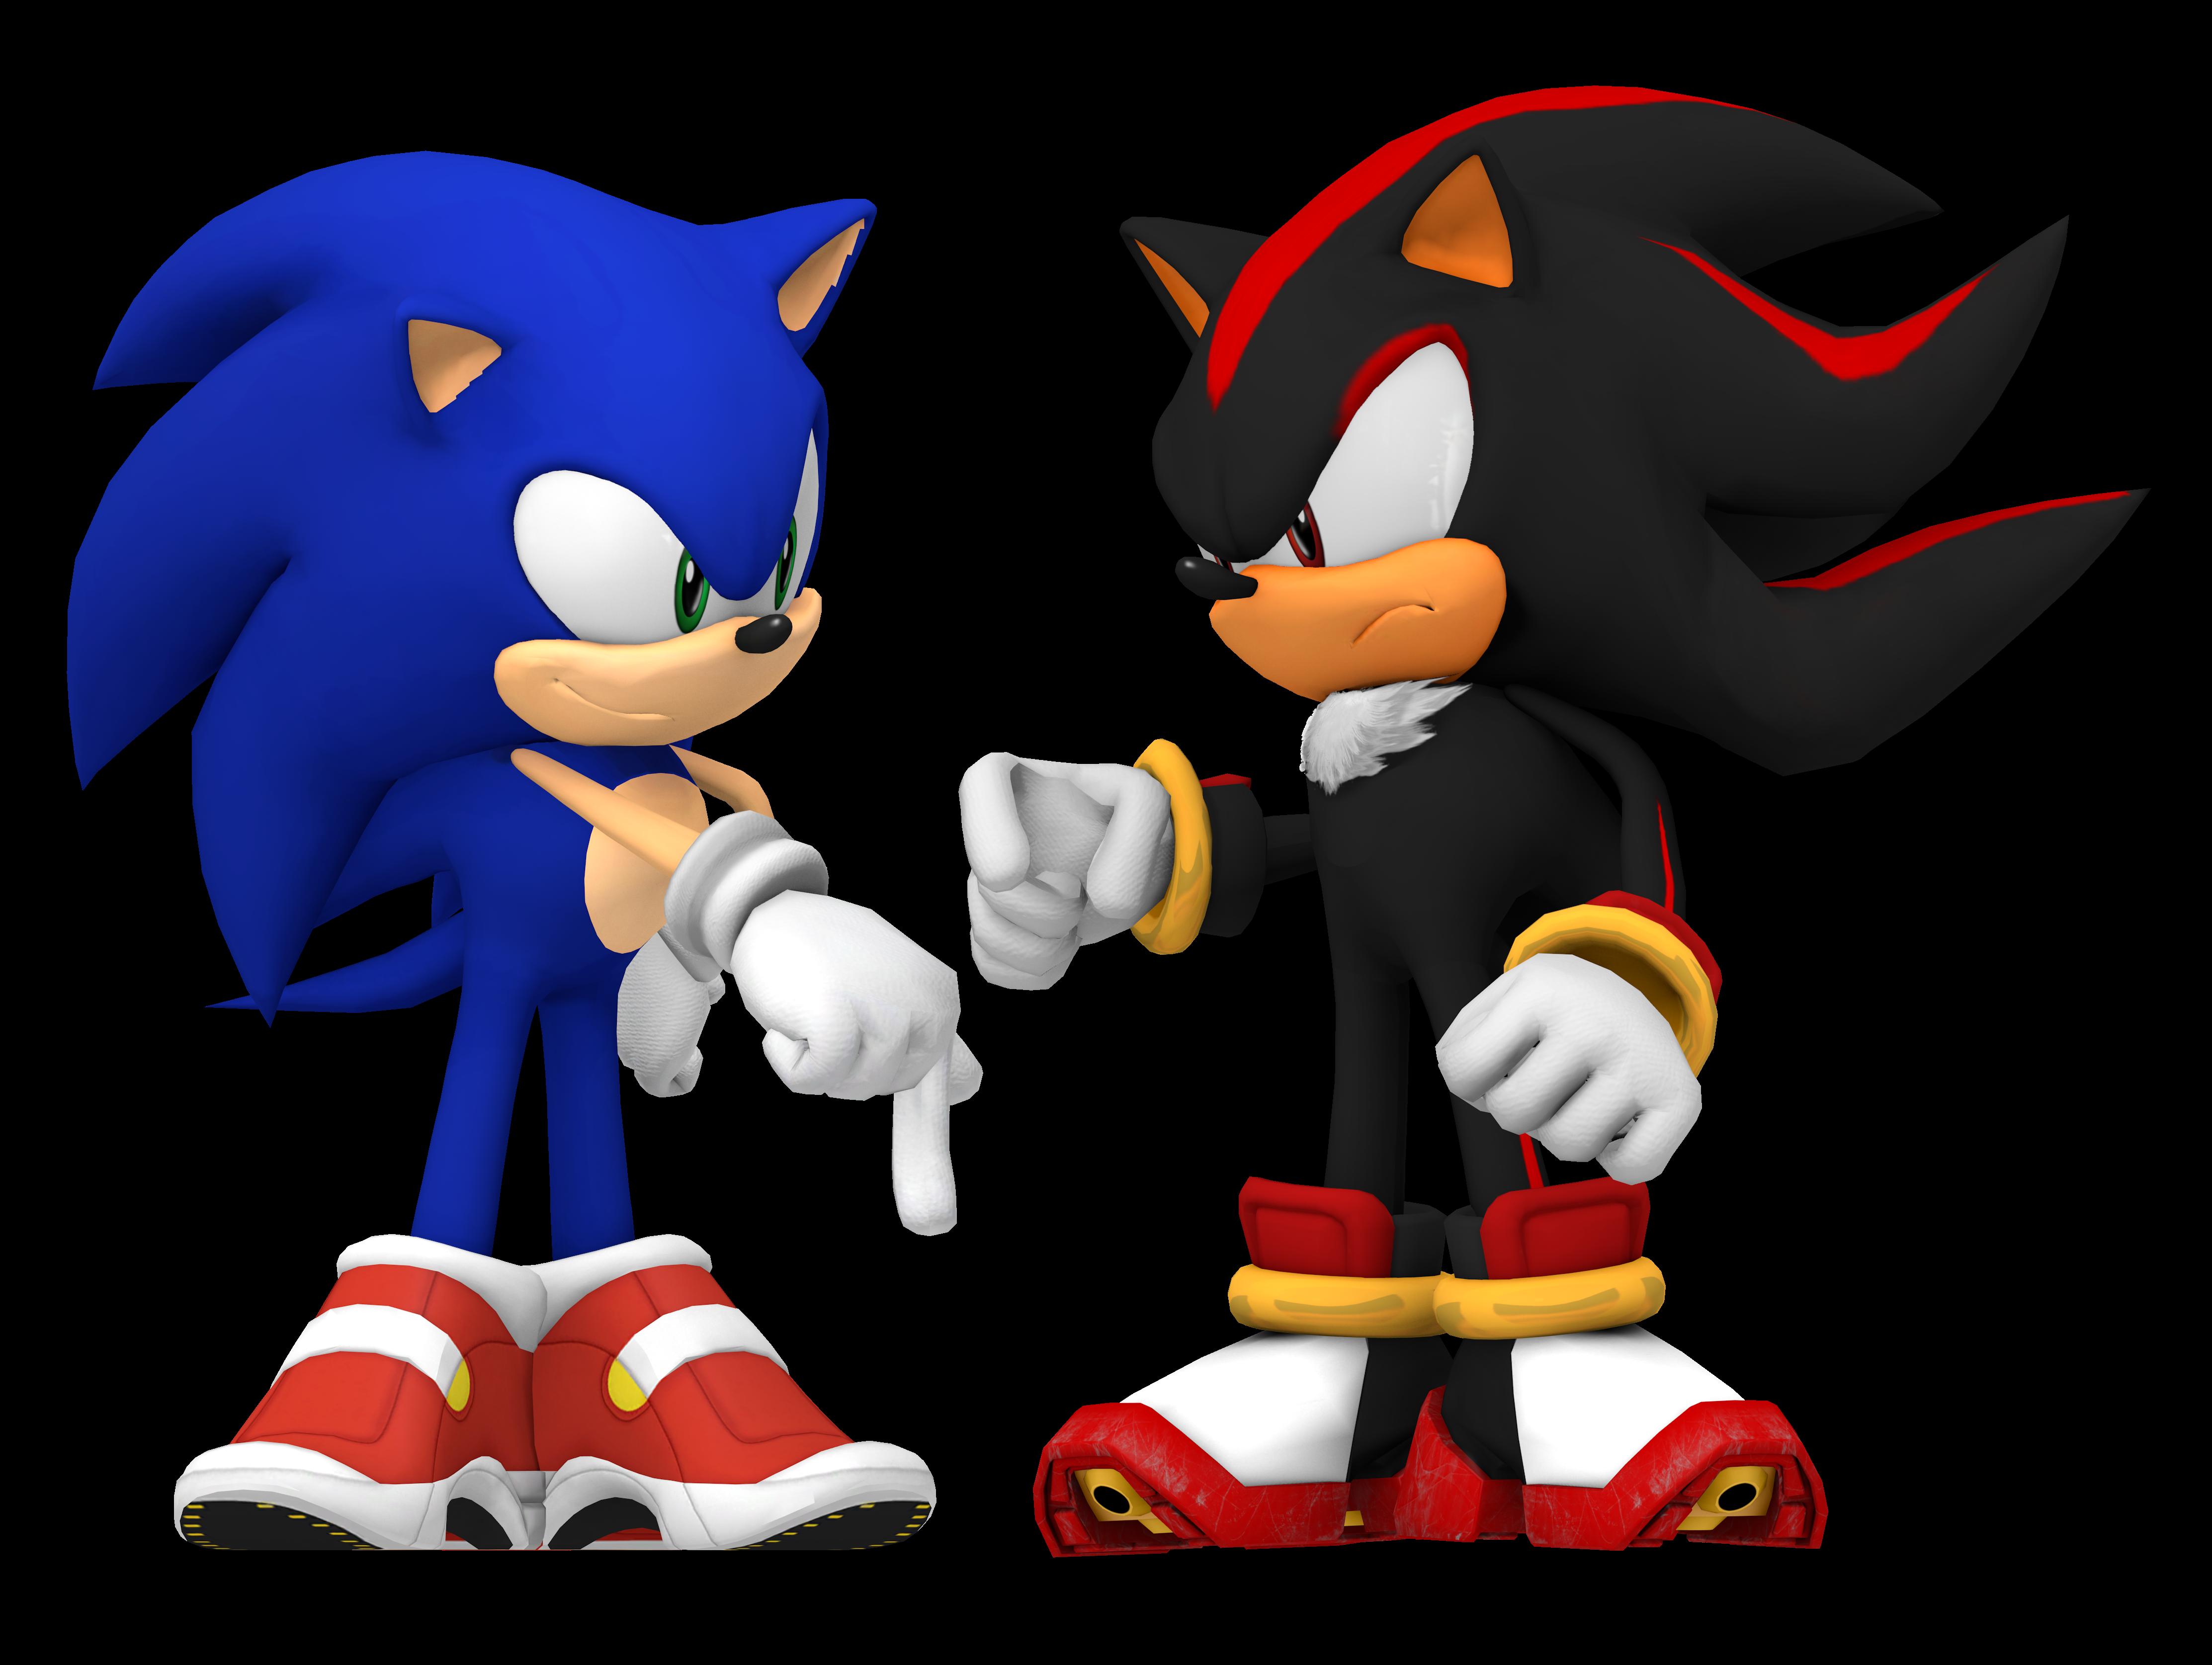 Dreamcast Era Sonic Adventure 2 Battle Render By Bandicootbrawl96 On Deviantart